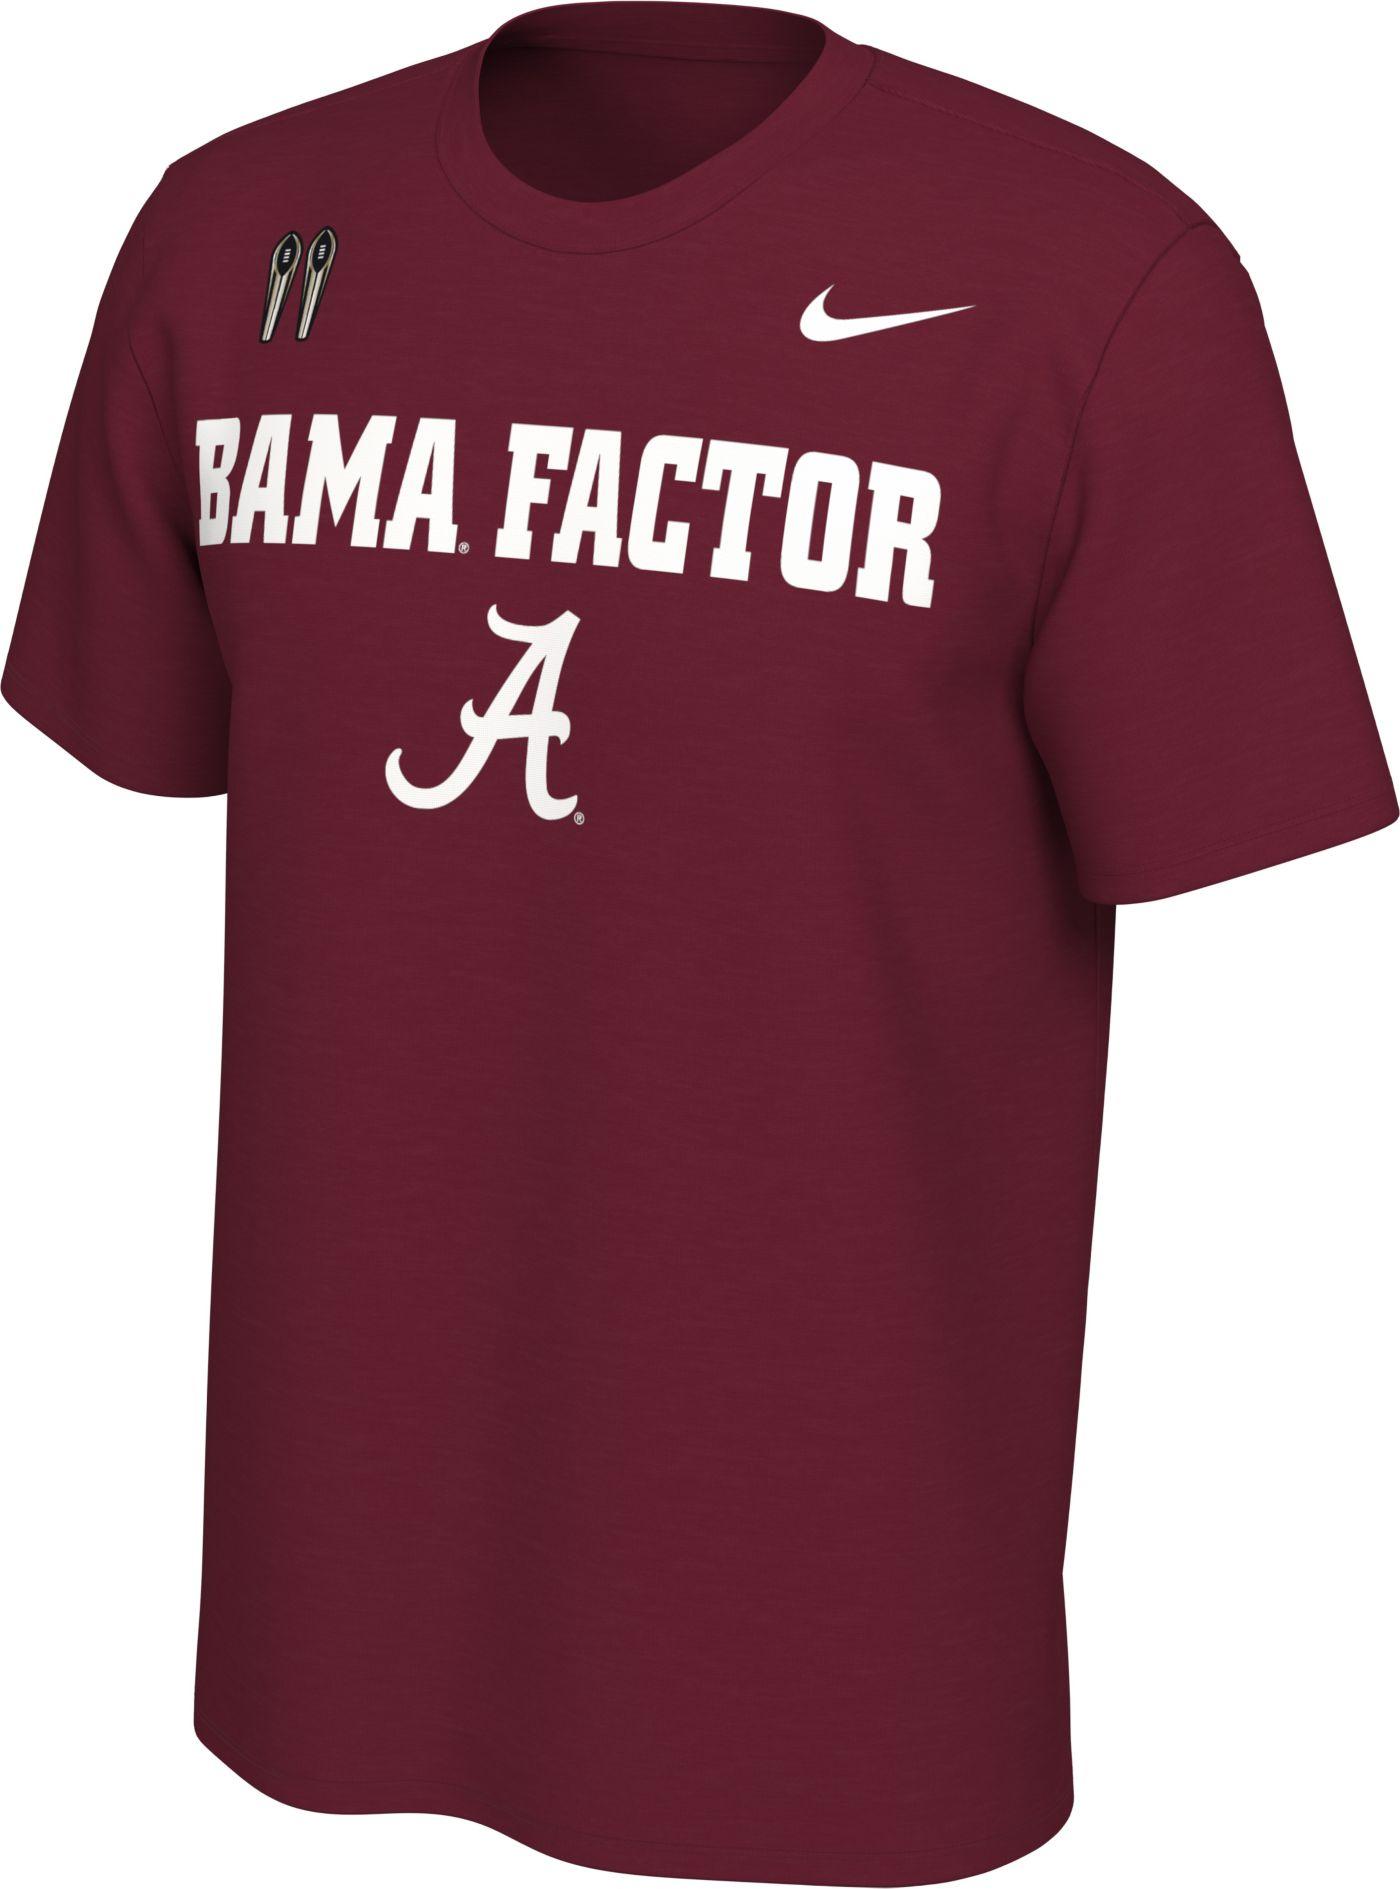 Nike Men's Alabama Crimson Tide Crimson Mantra T-Shirt